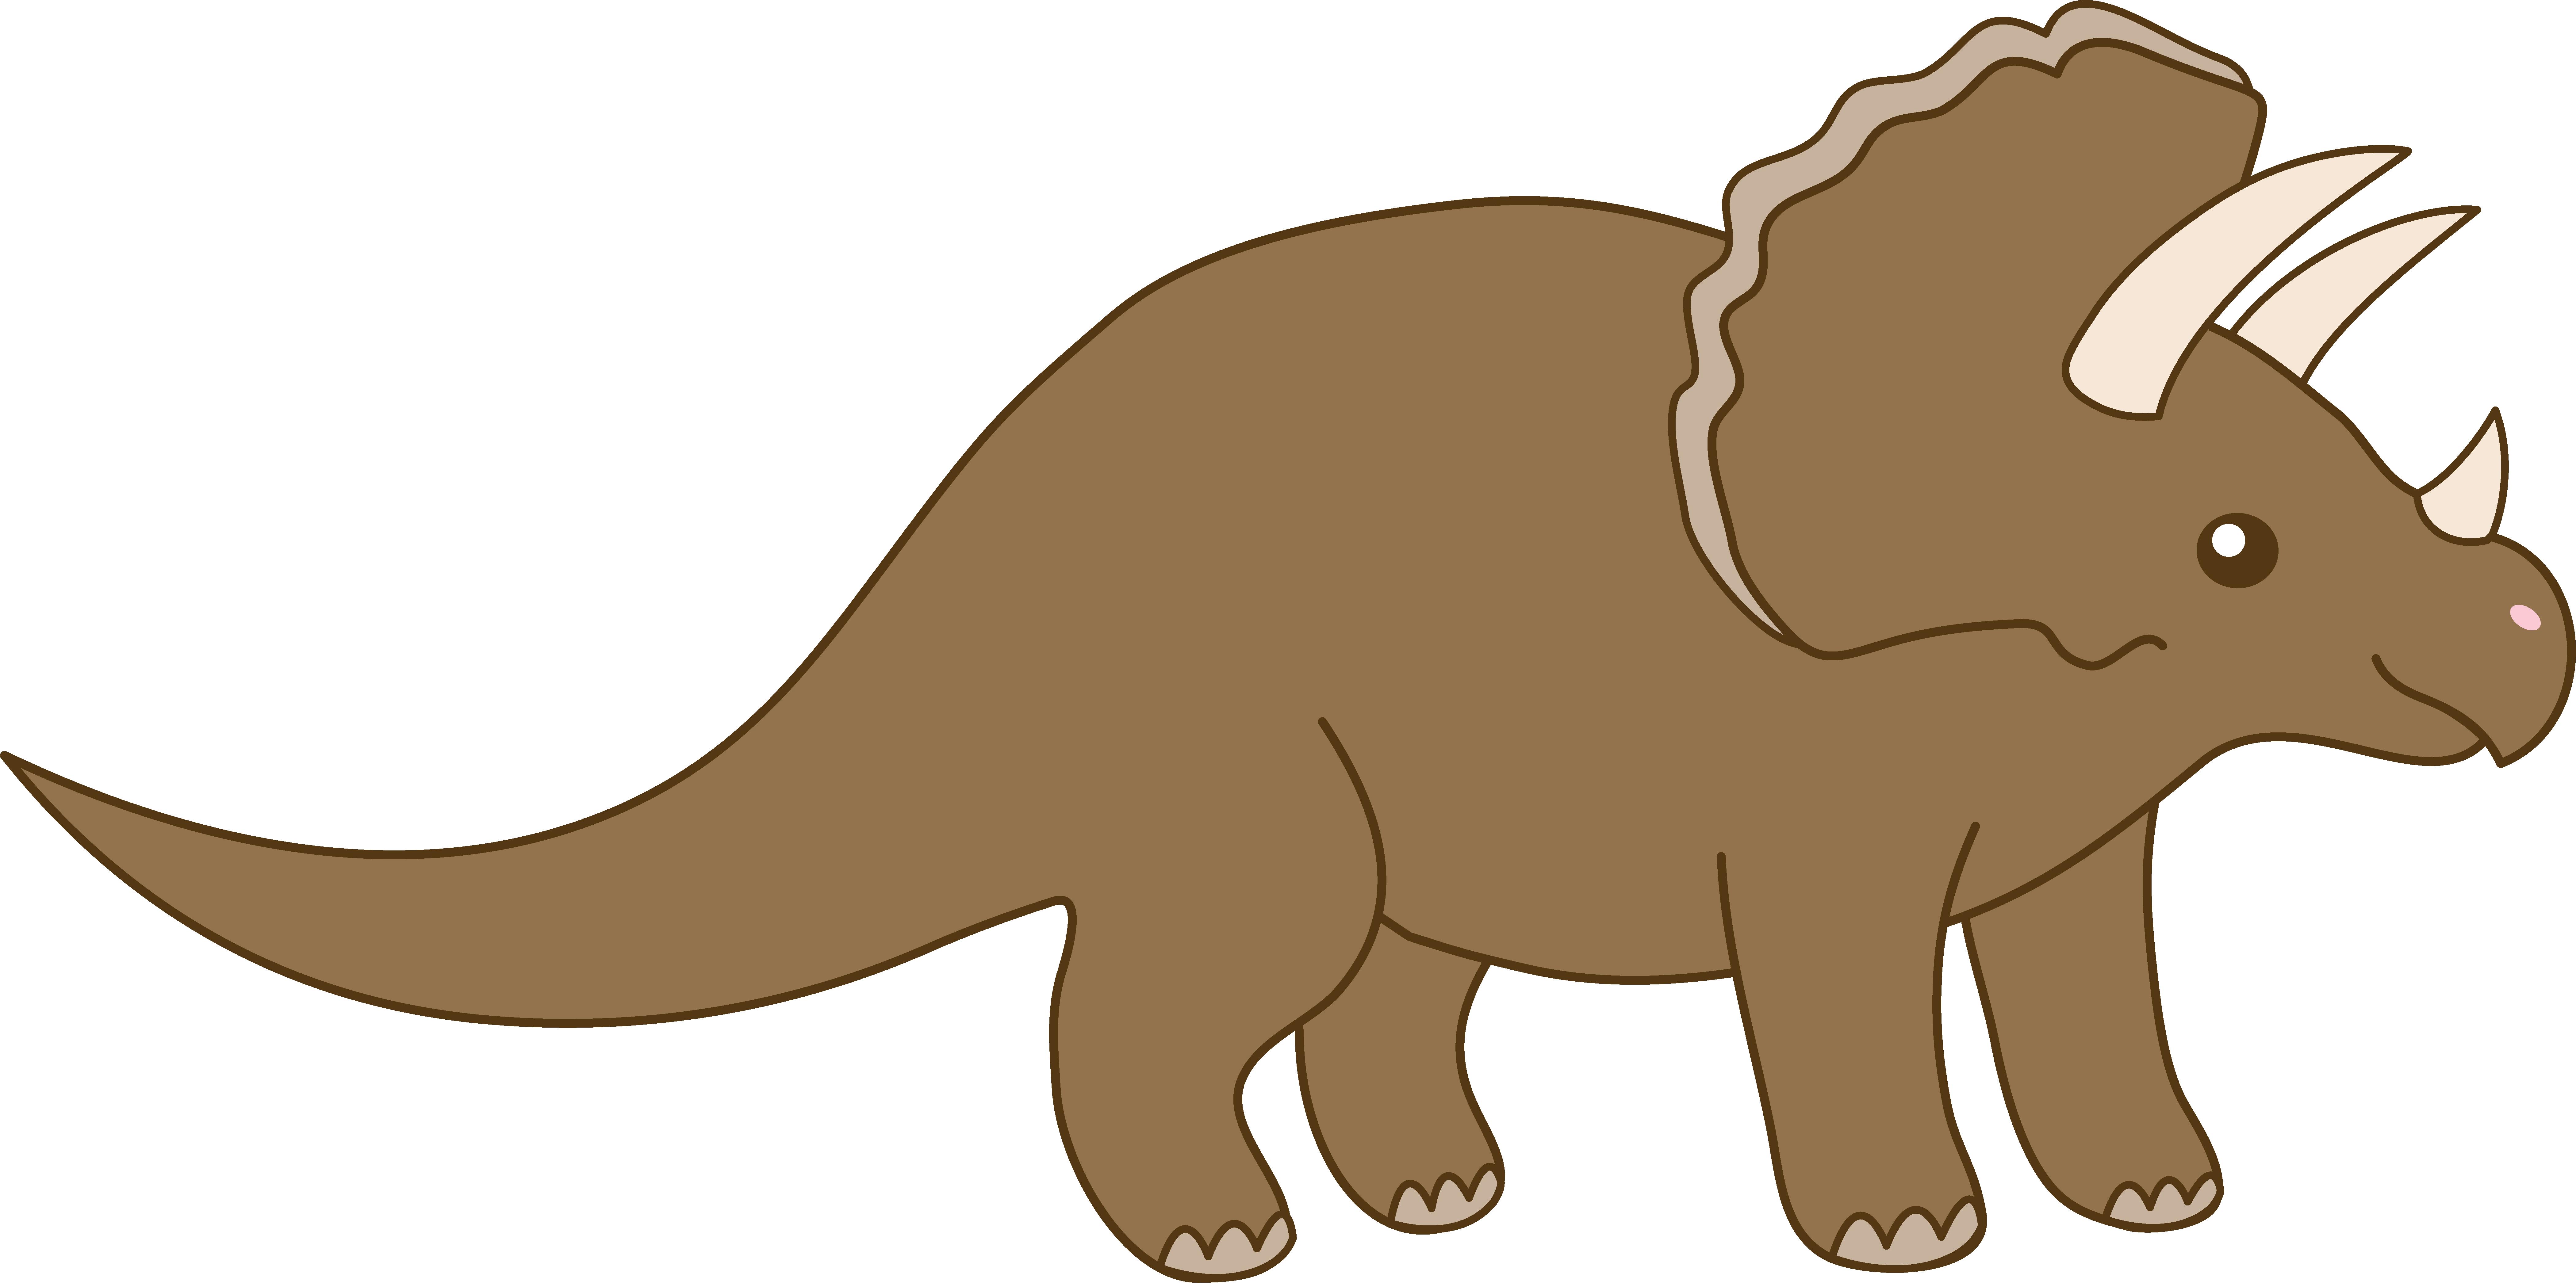 Dinosaur clipart brown. Hd transparent png image